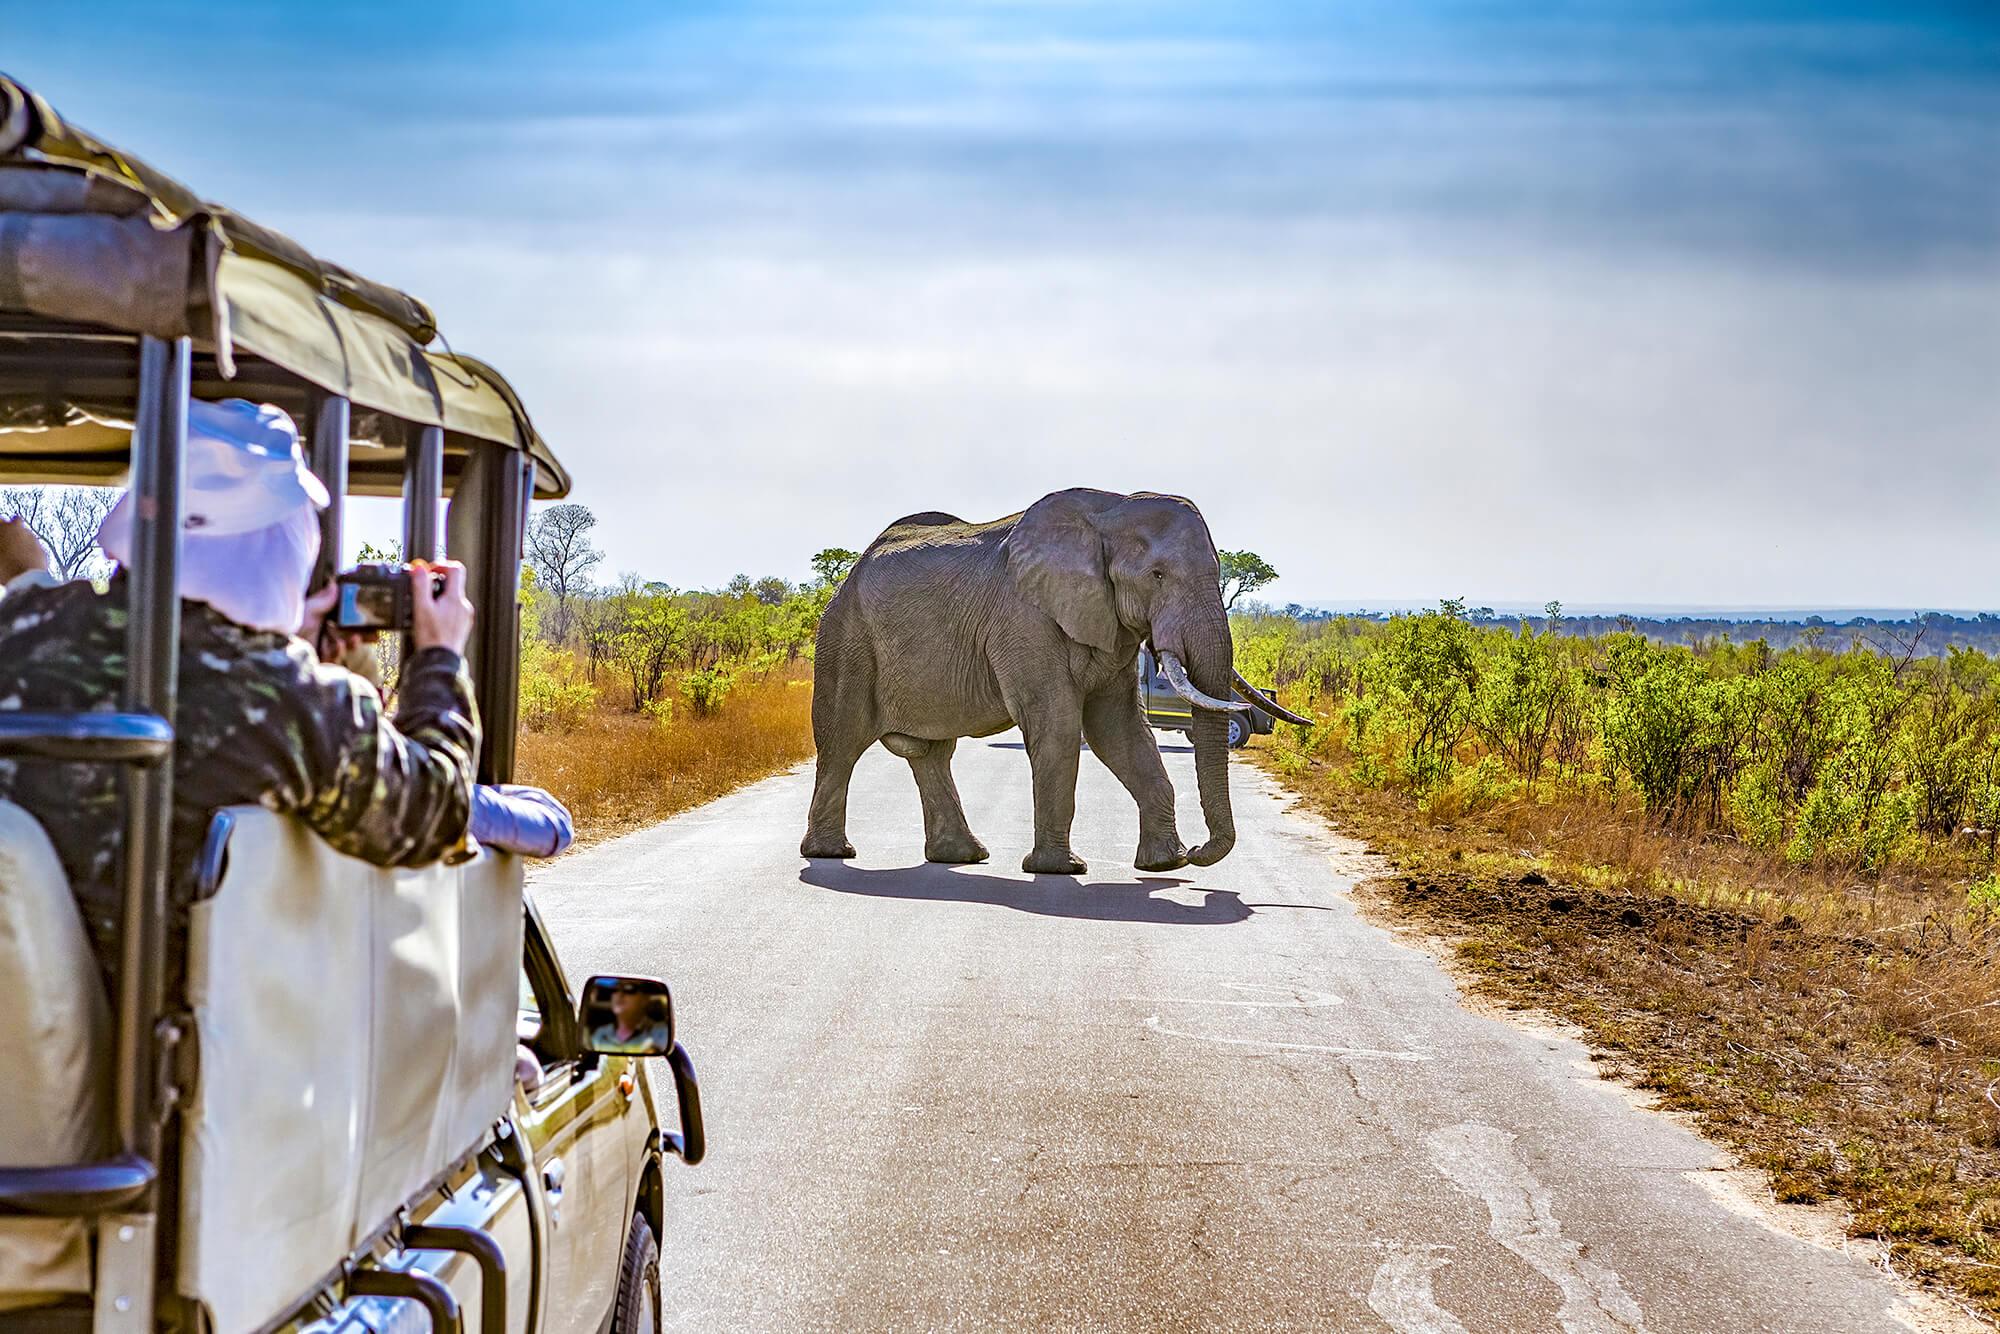 Zuid-Afrika Safari in Kruger National Park